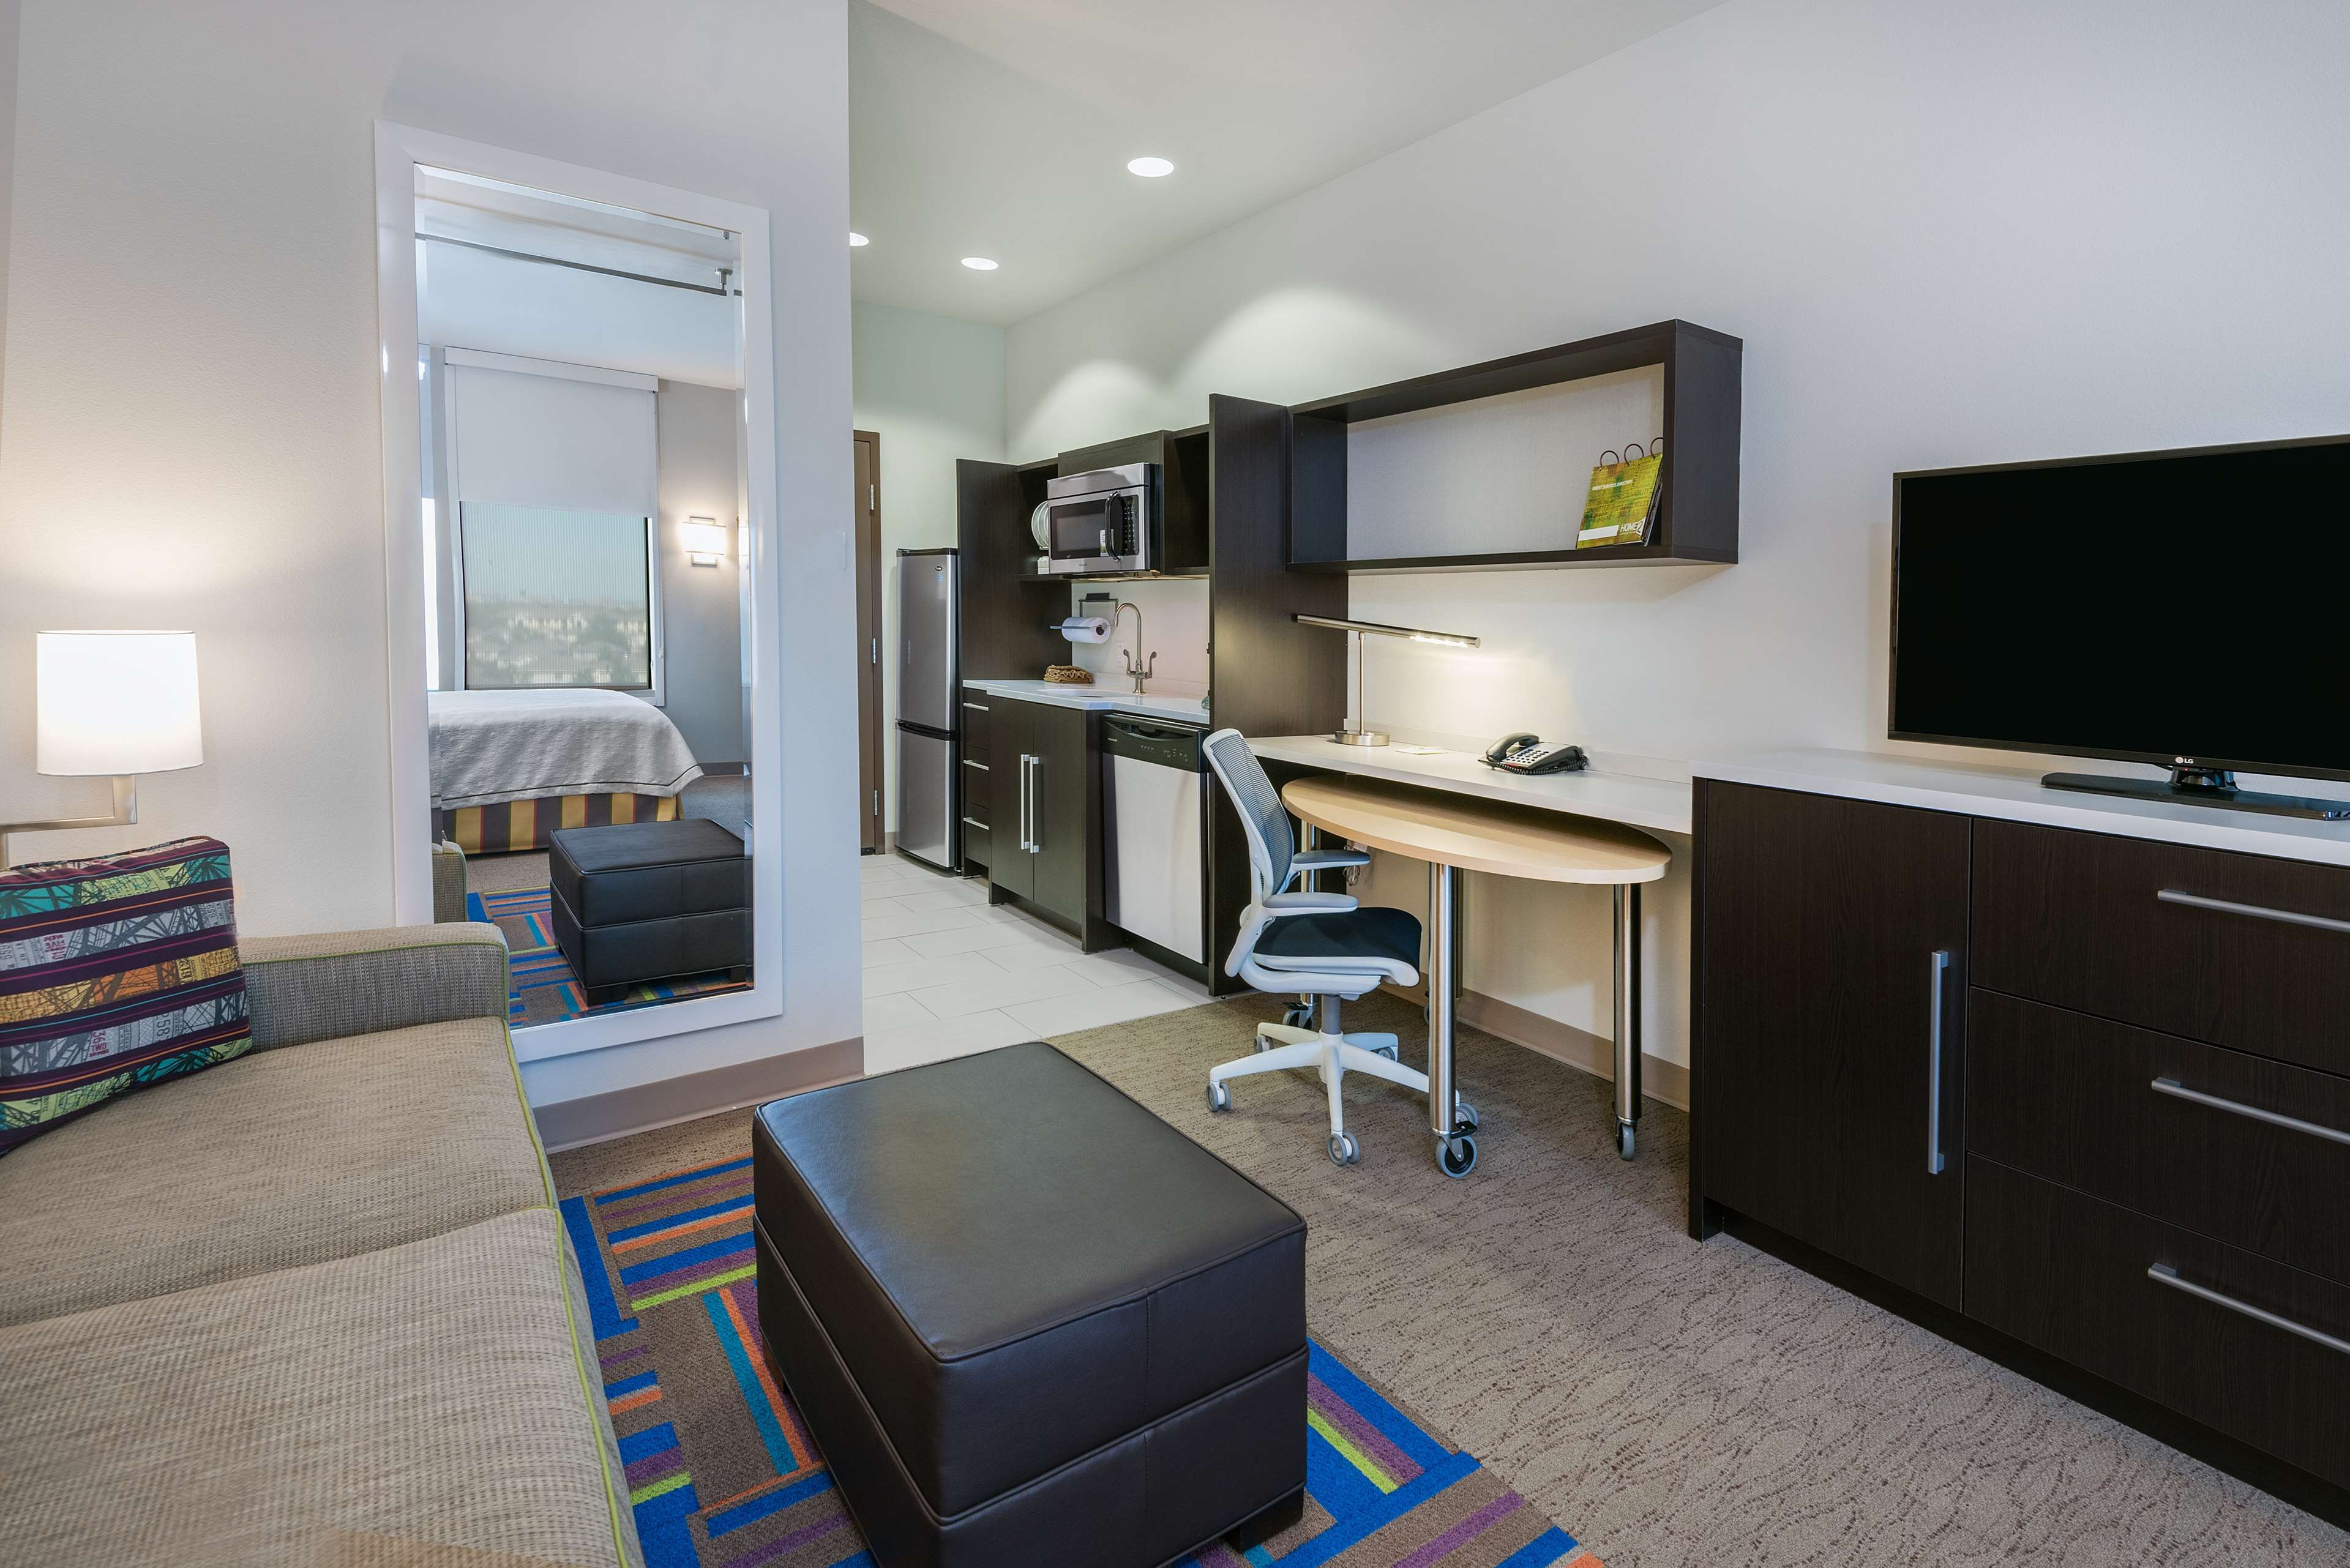 Home2 Suites by Hilton Austin Airport image 24